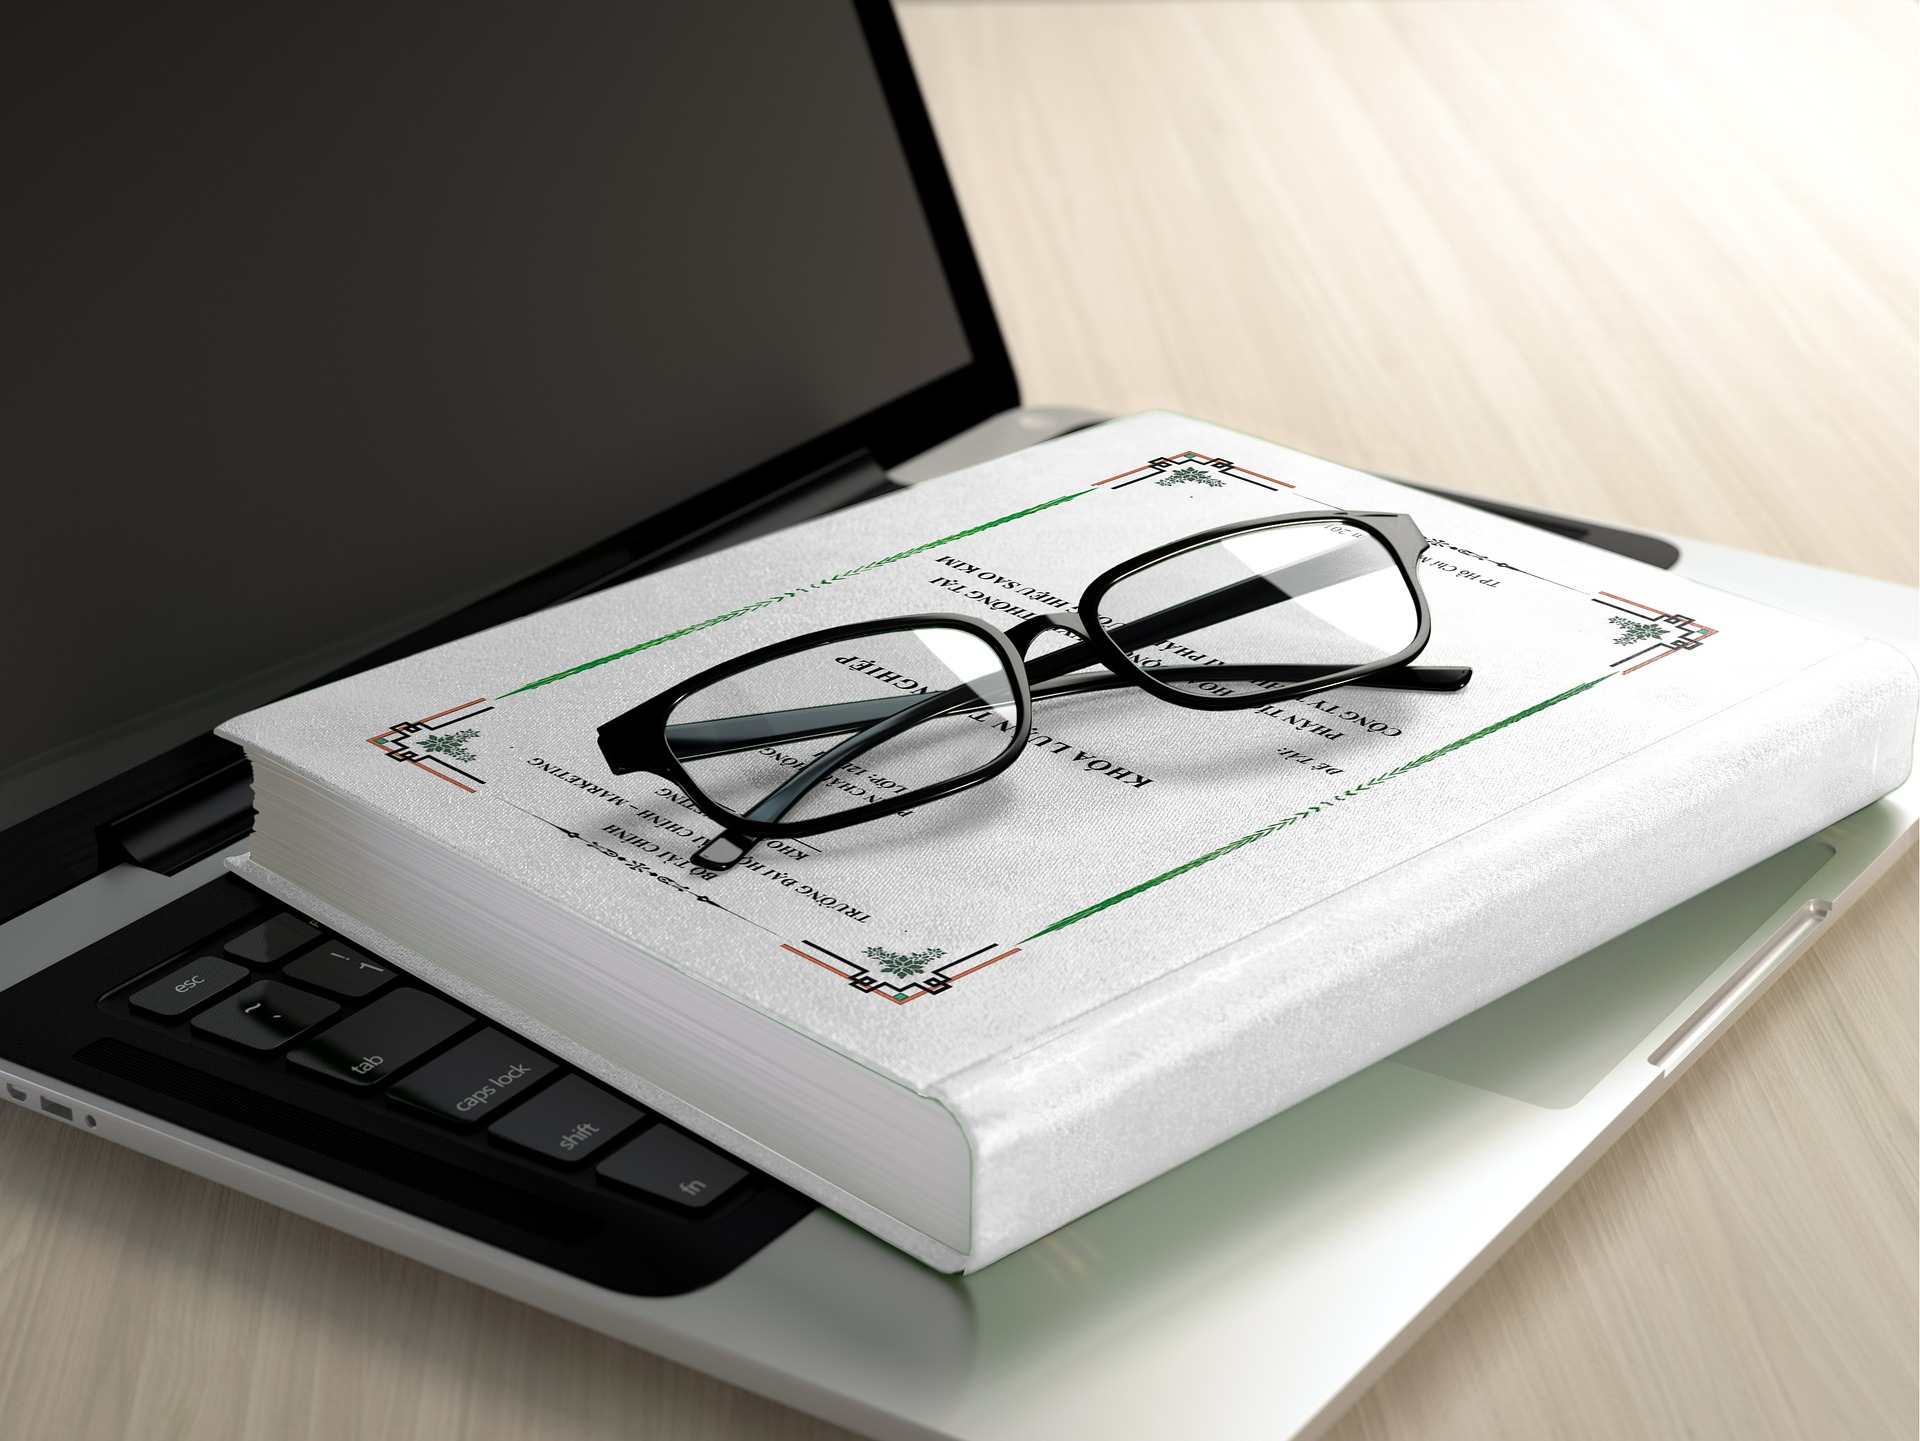 Laptop Akkulaufzeit Testsieger